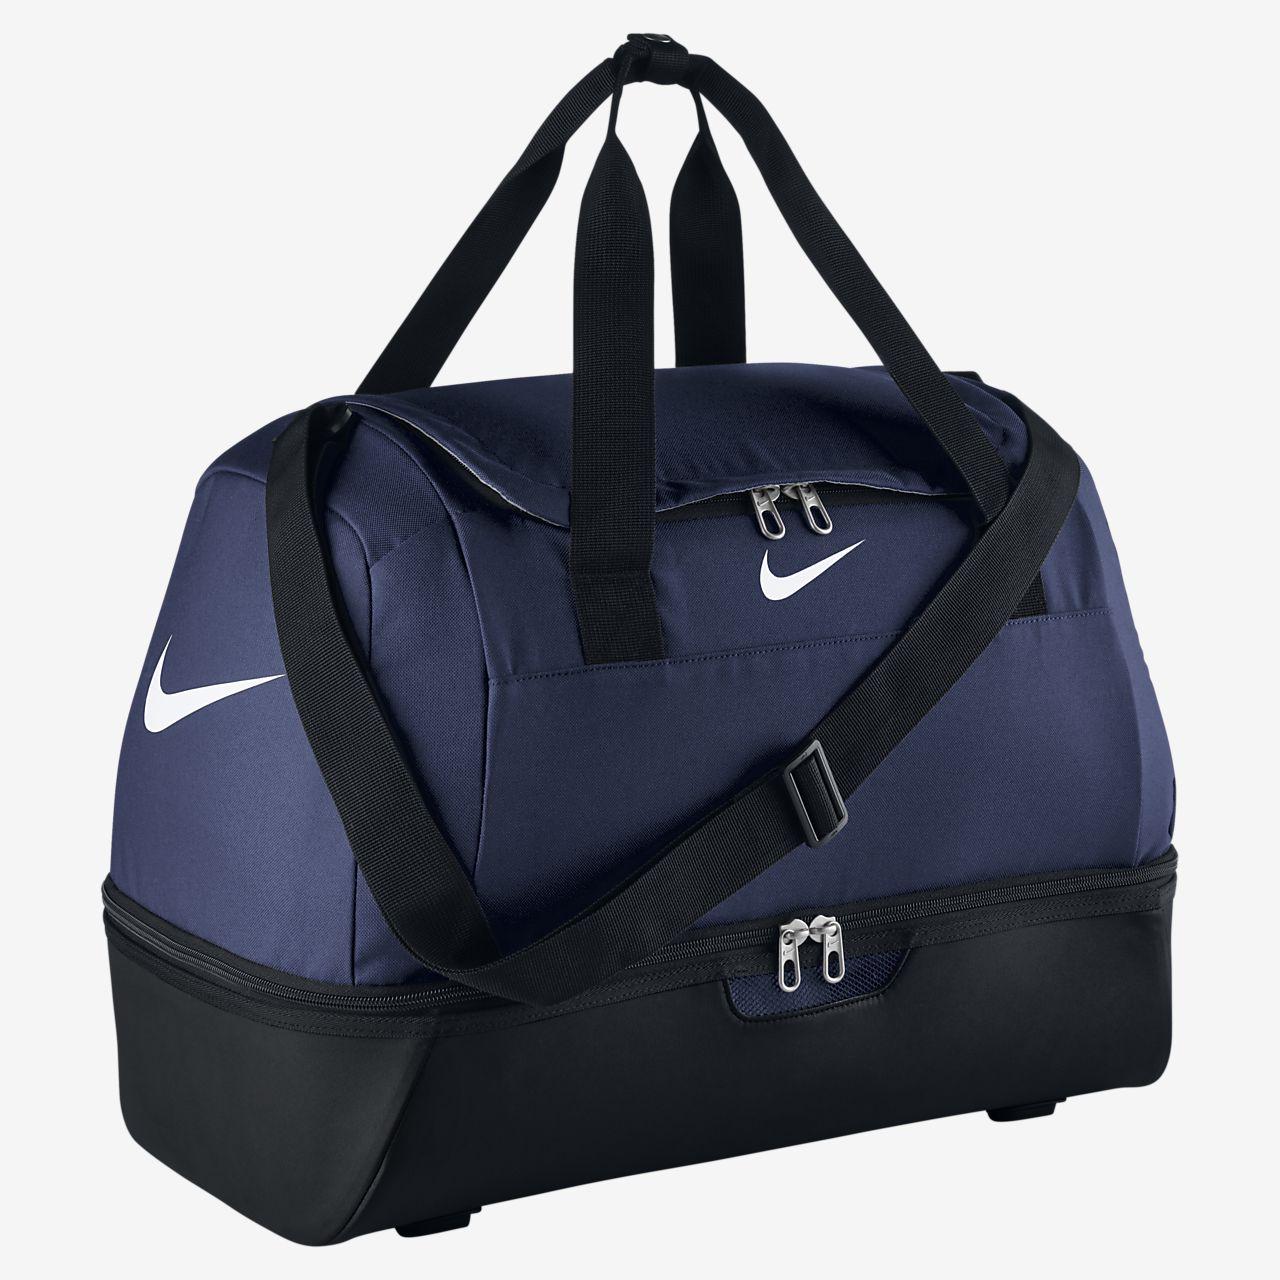 fe8de37a90ab9 Bolso de fútbol Nike Soccer Club Team Hardcase (mediana). Nike.com MX